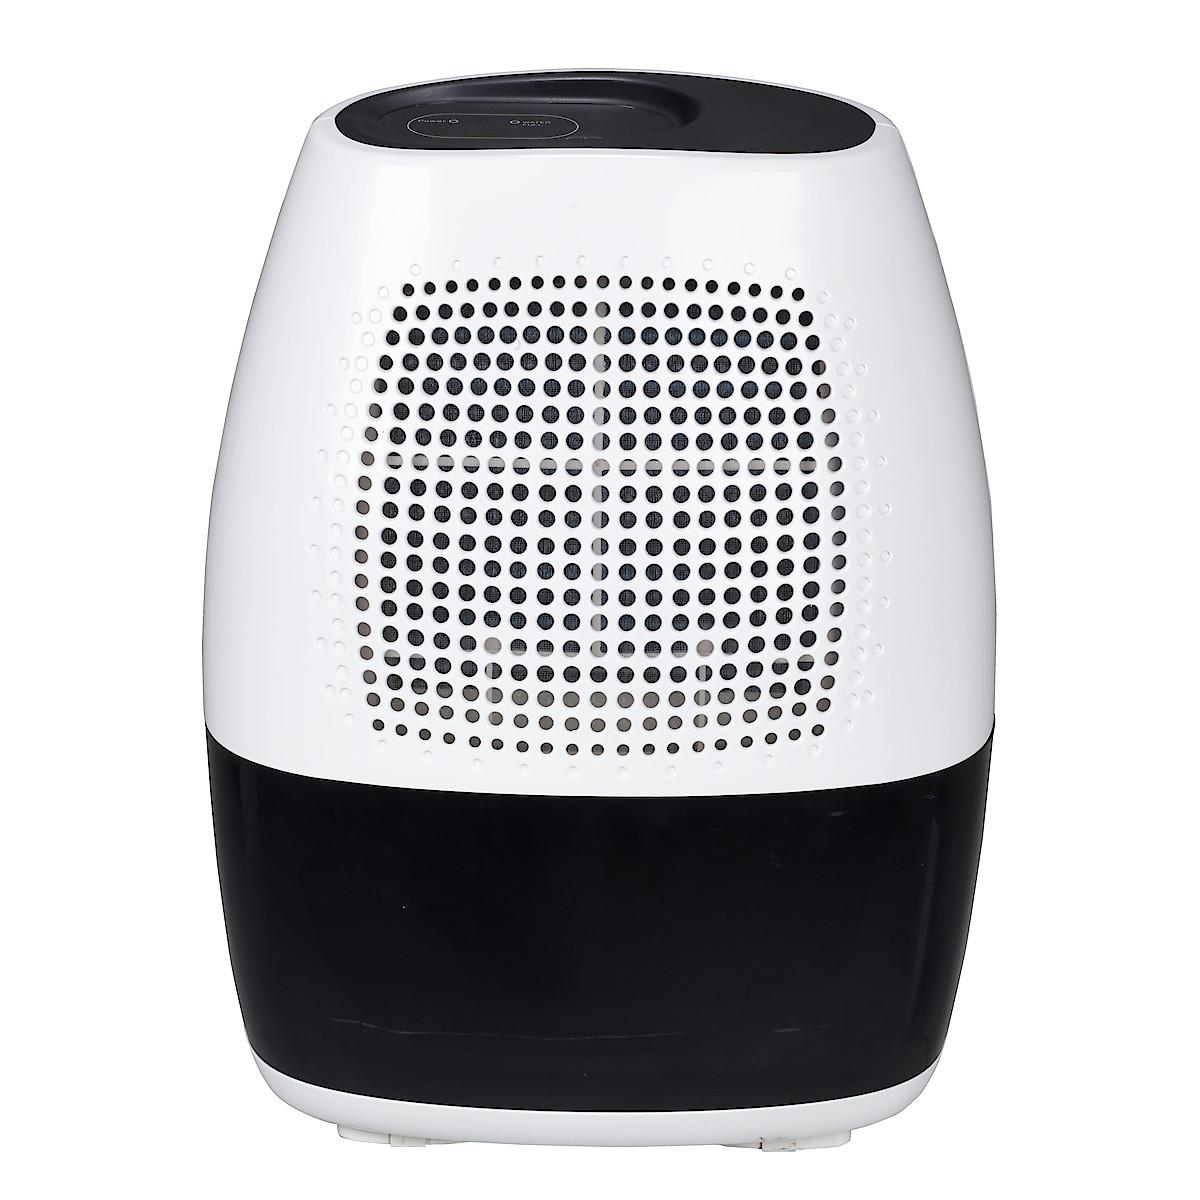 Cotech 10 l Dehumidifier